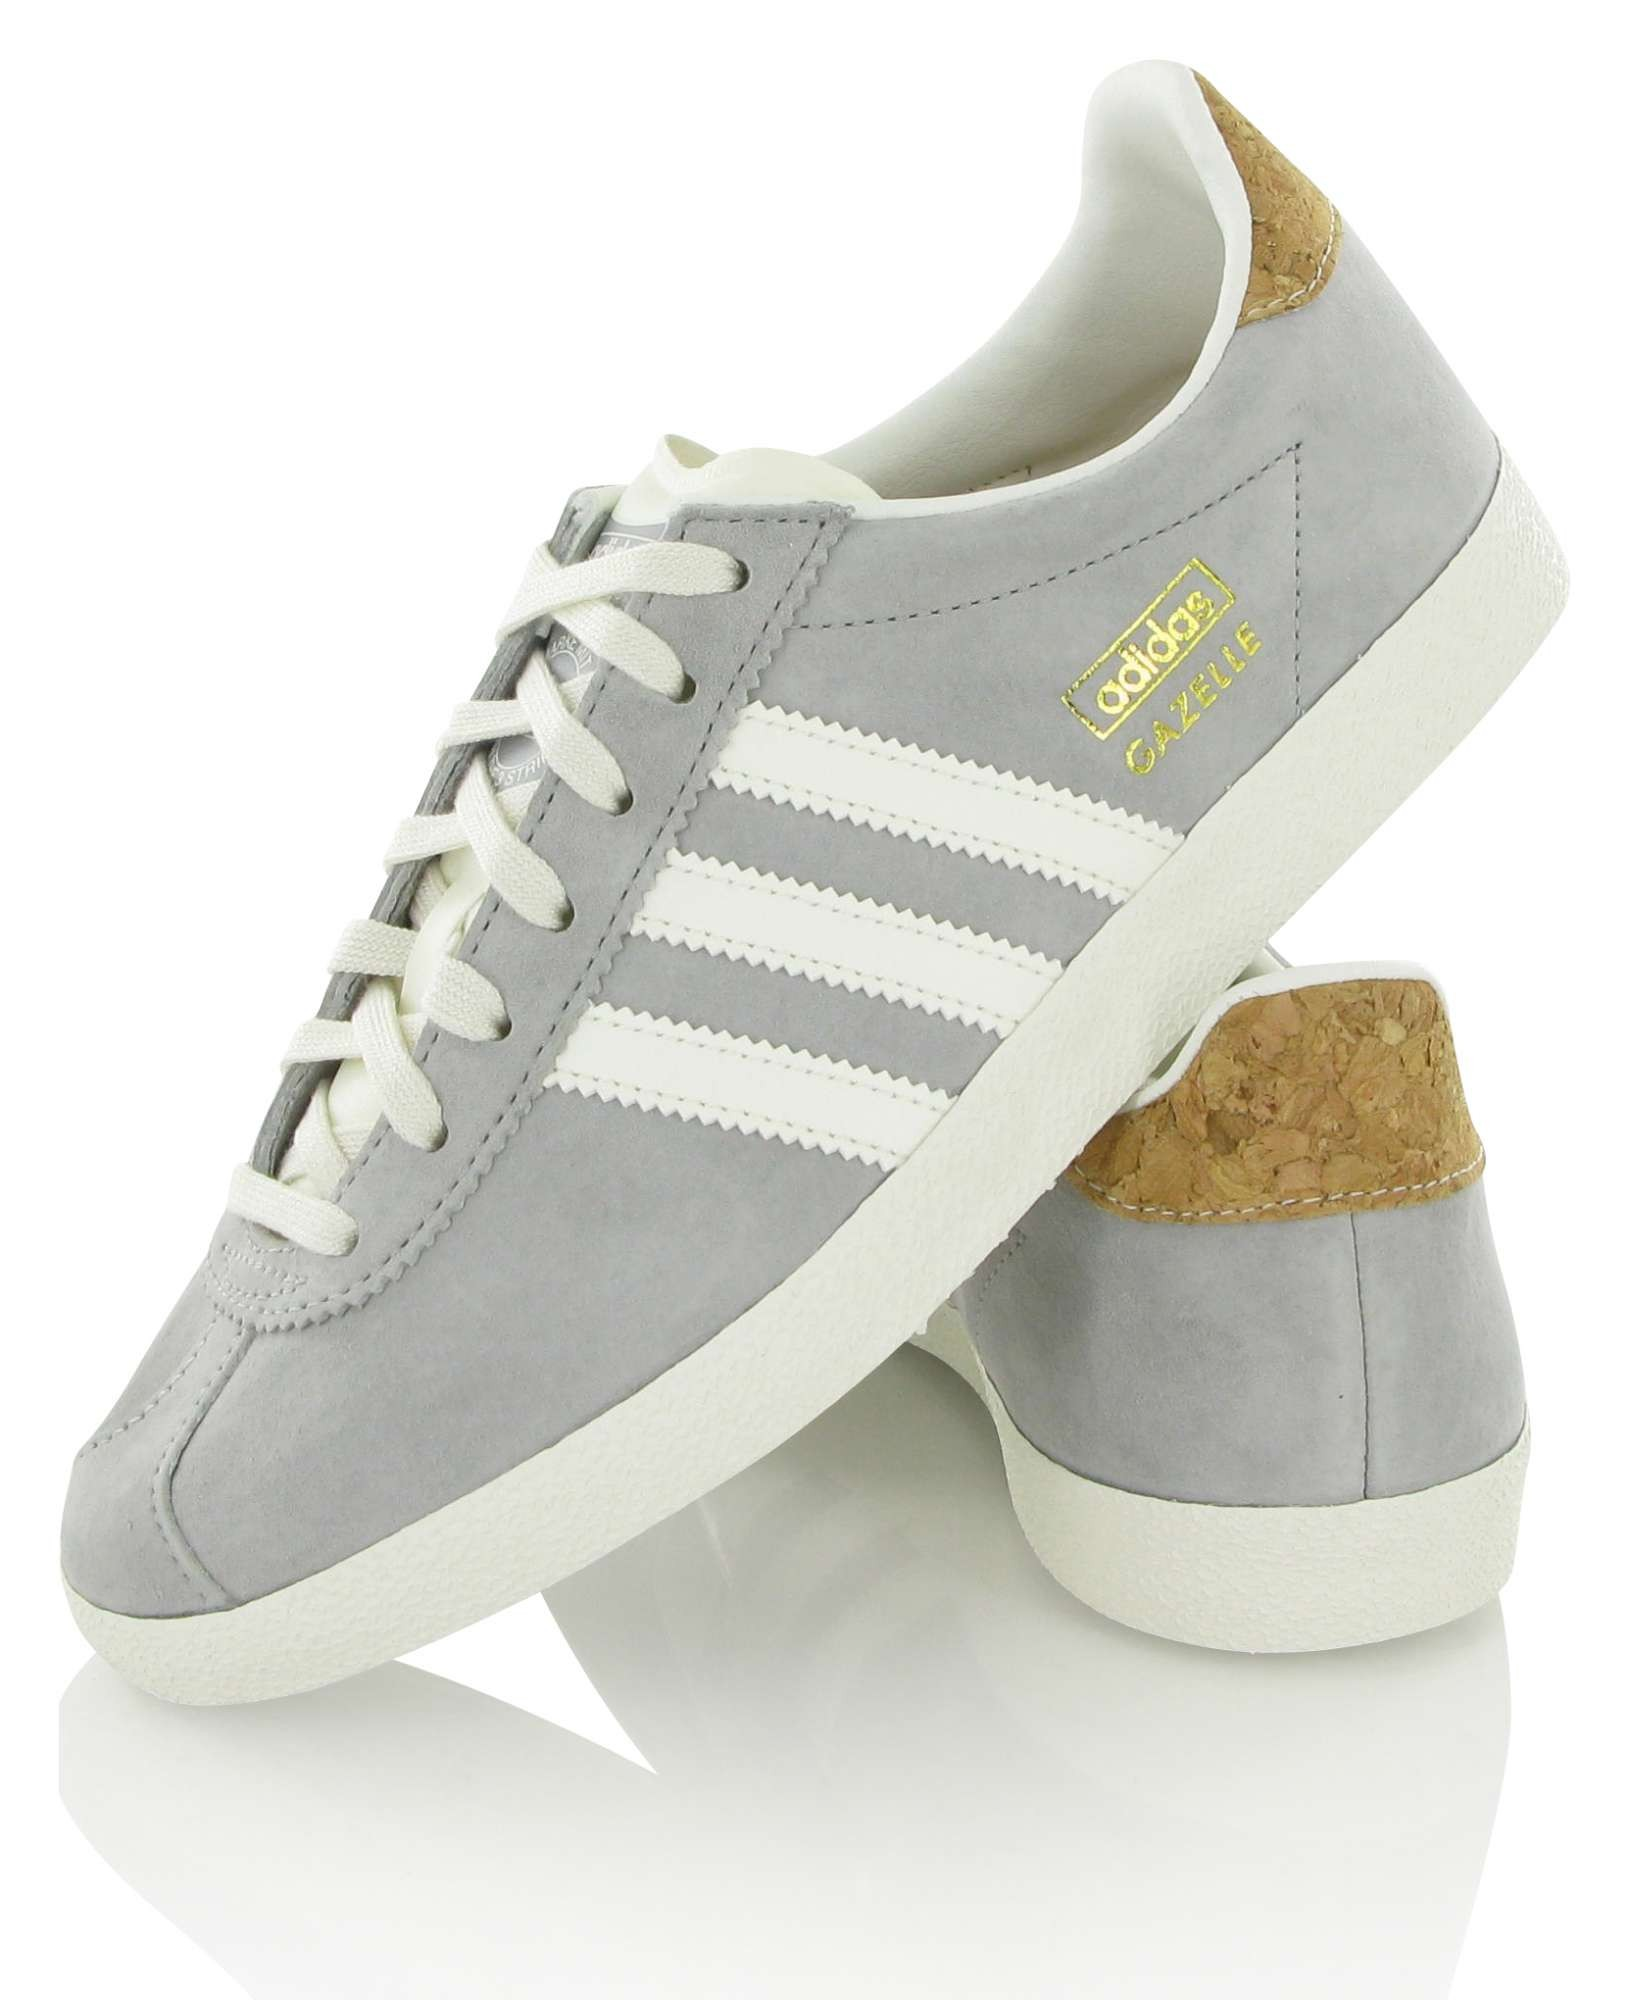 adidas gazelle grise clair femme